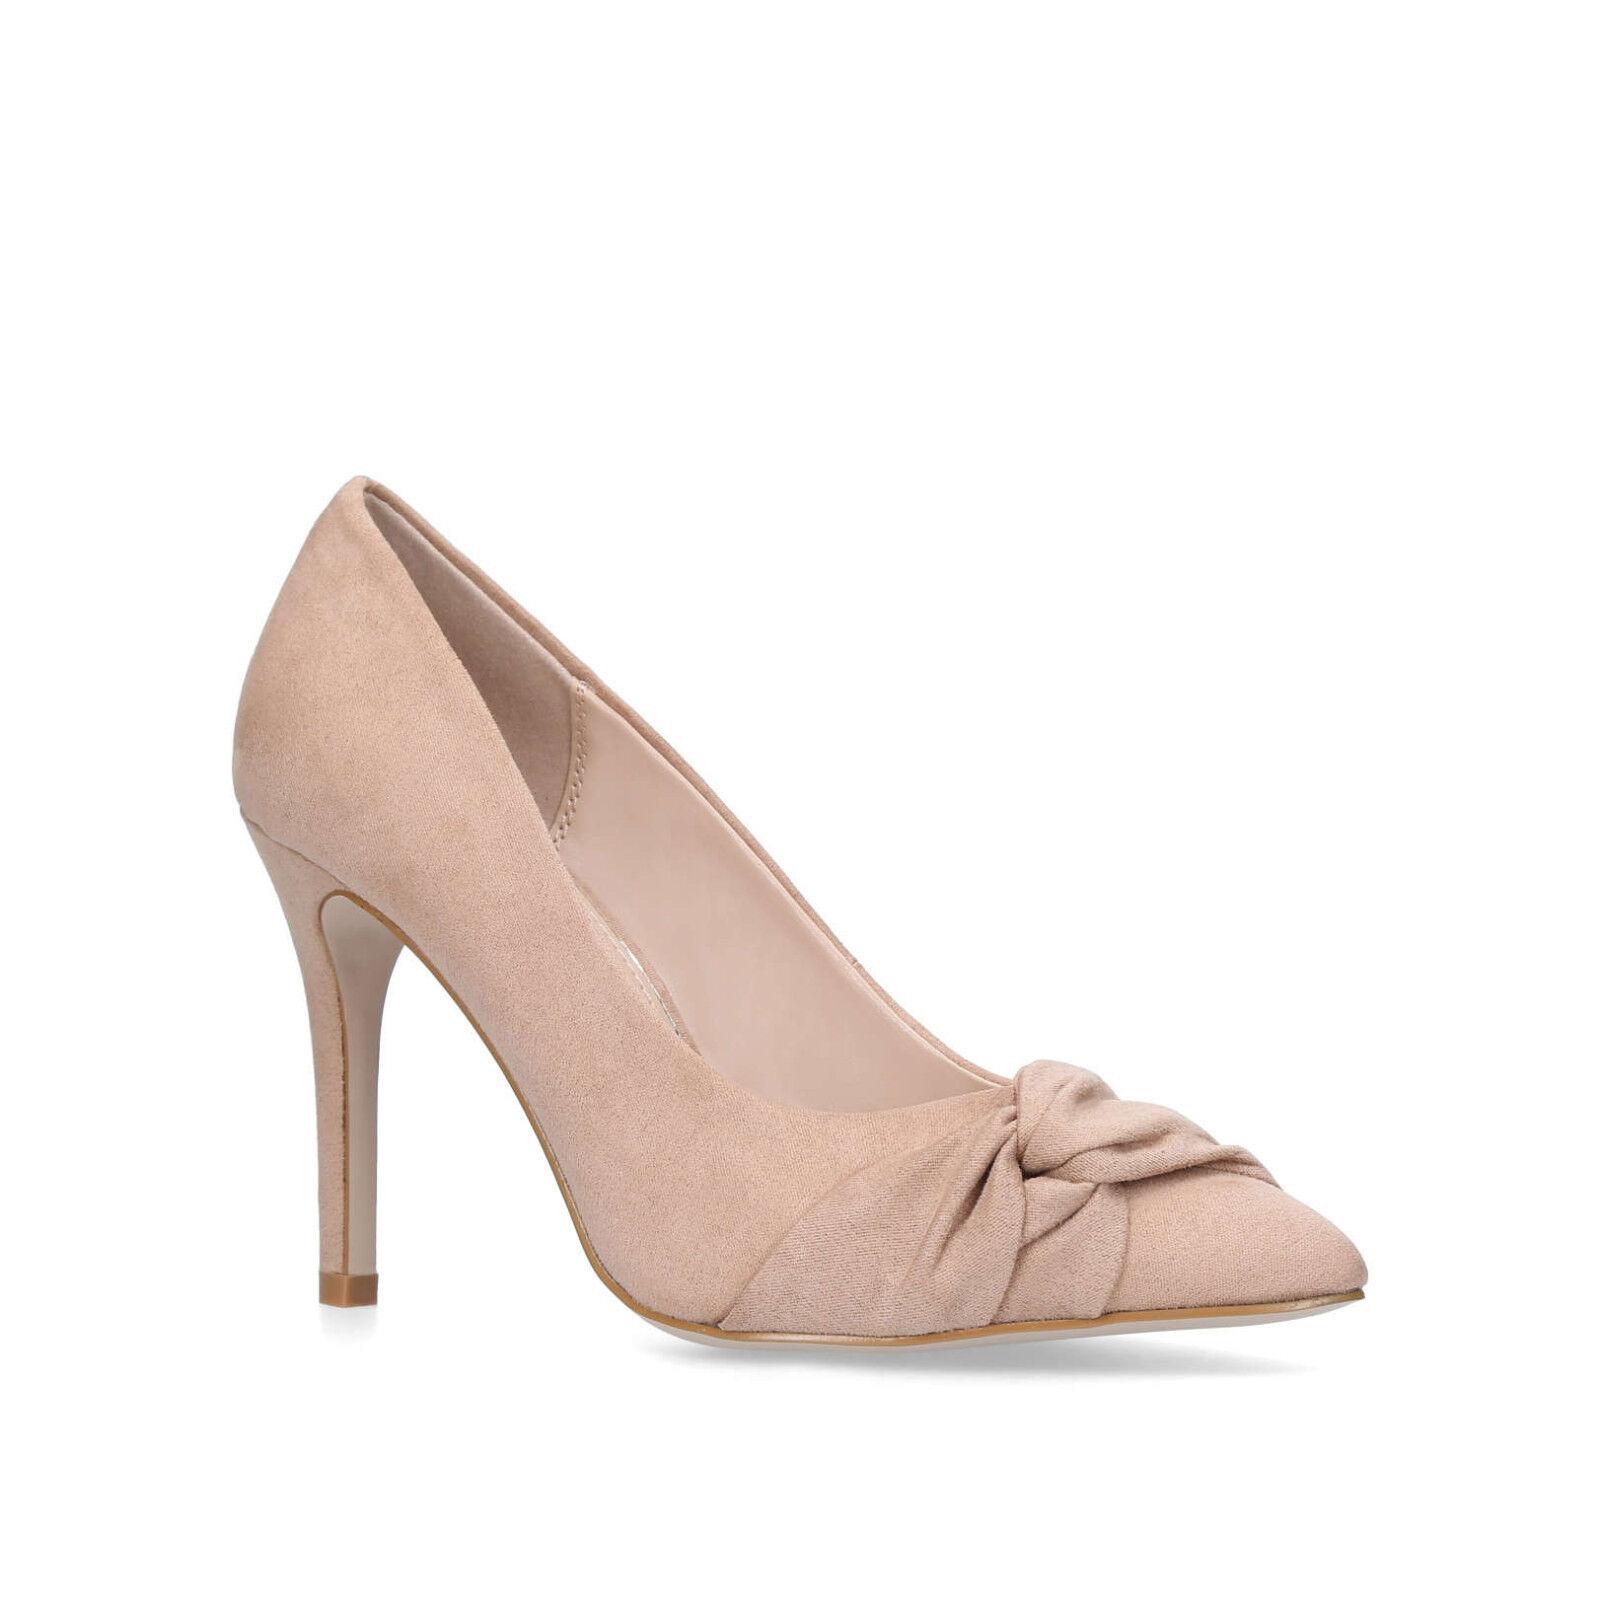 Kurt Geiger Miss KG Camilla court shoes